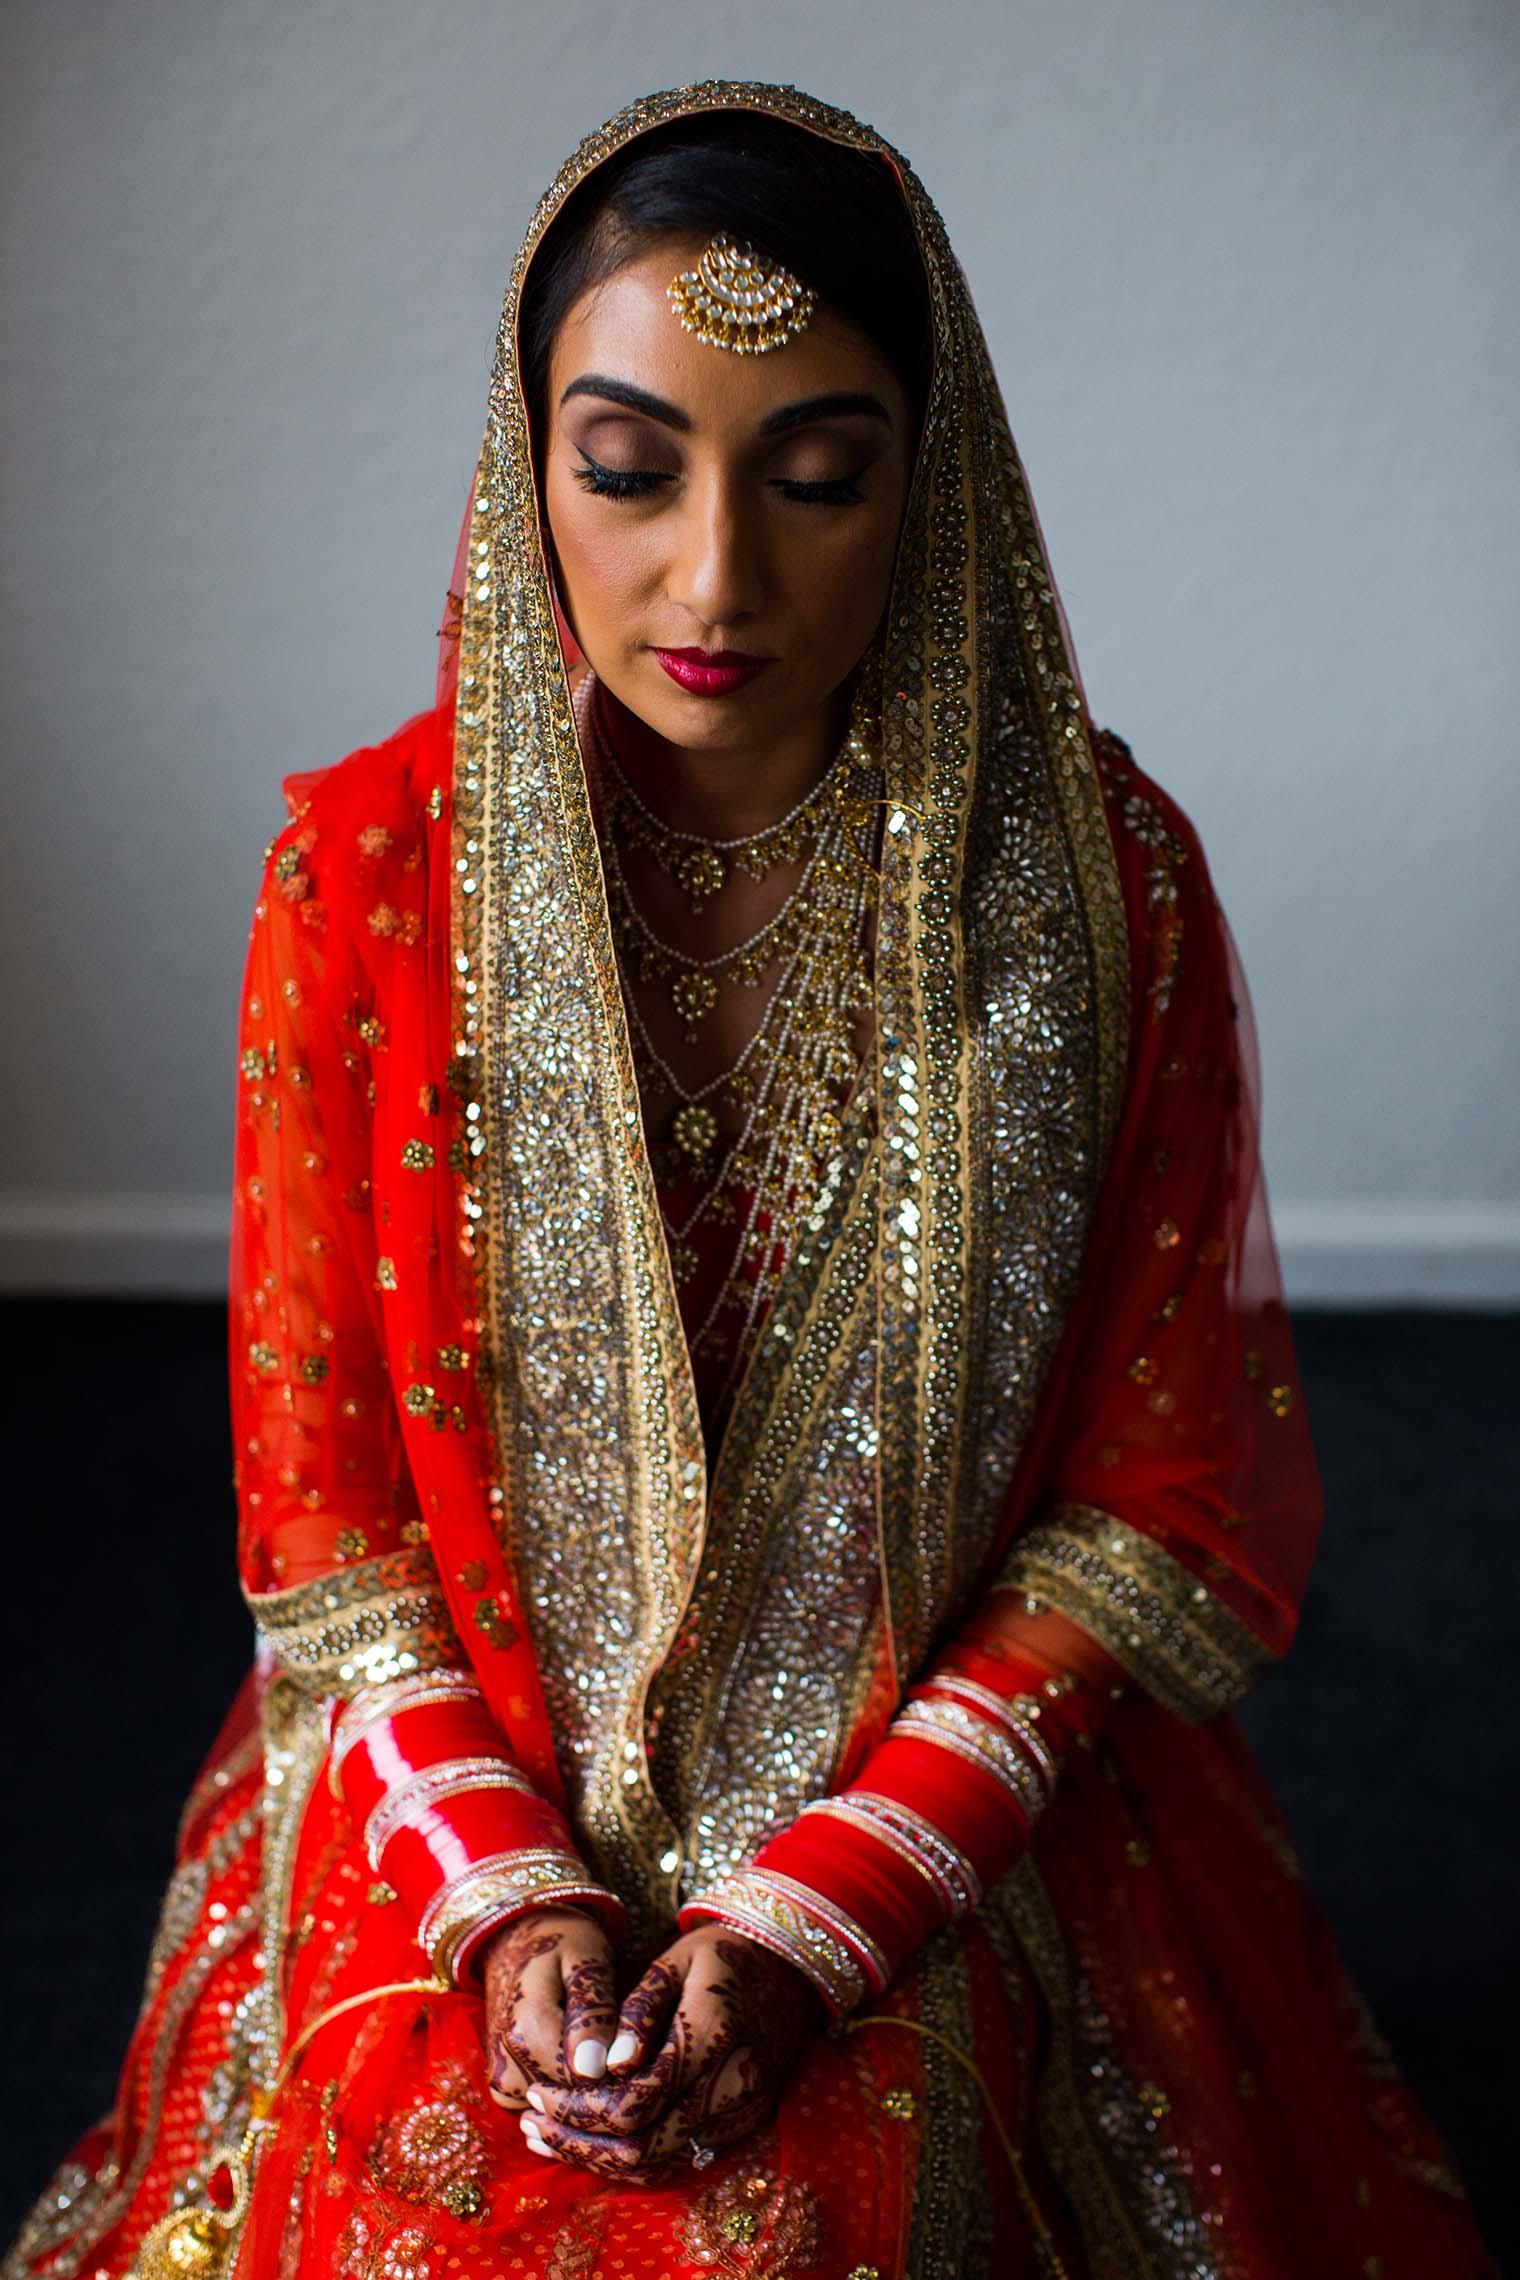 Indian Bride Portrait at Gurdwara Sahib of Fremont